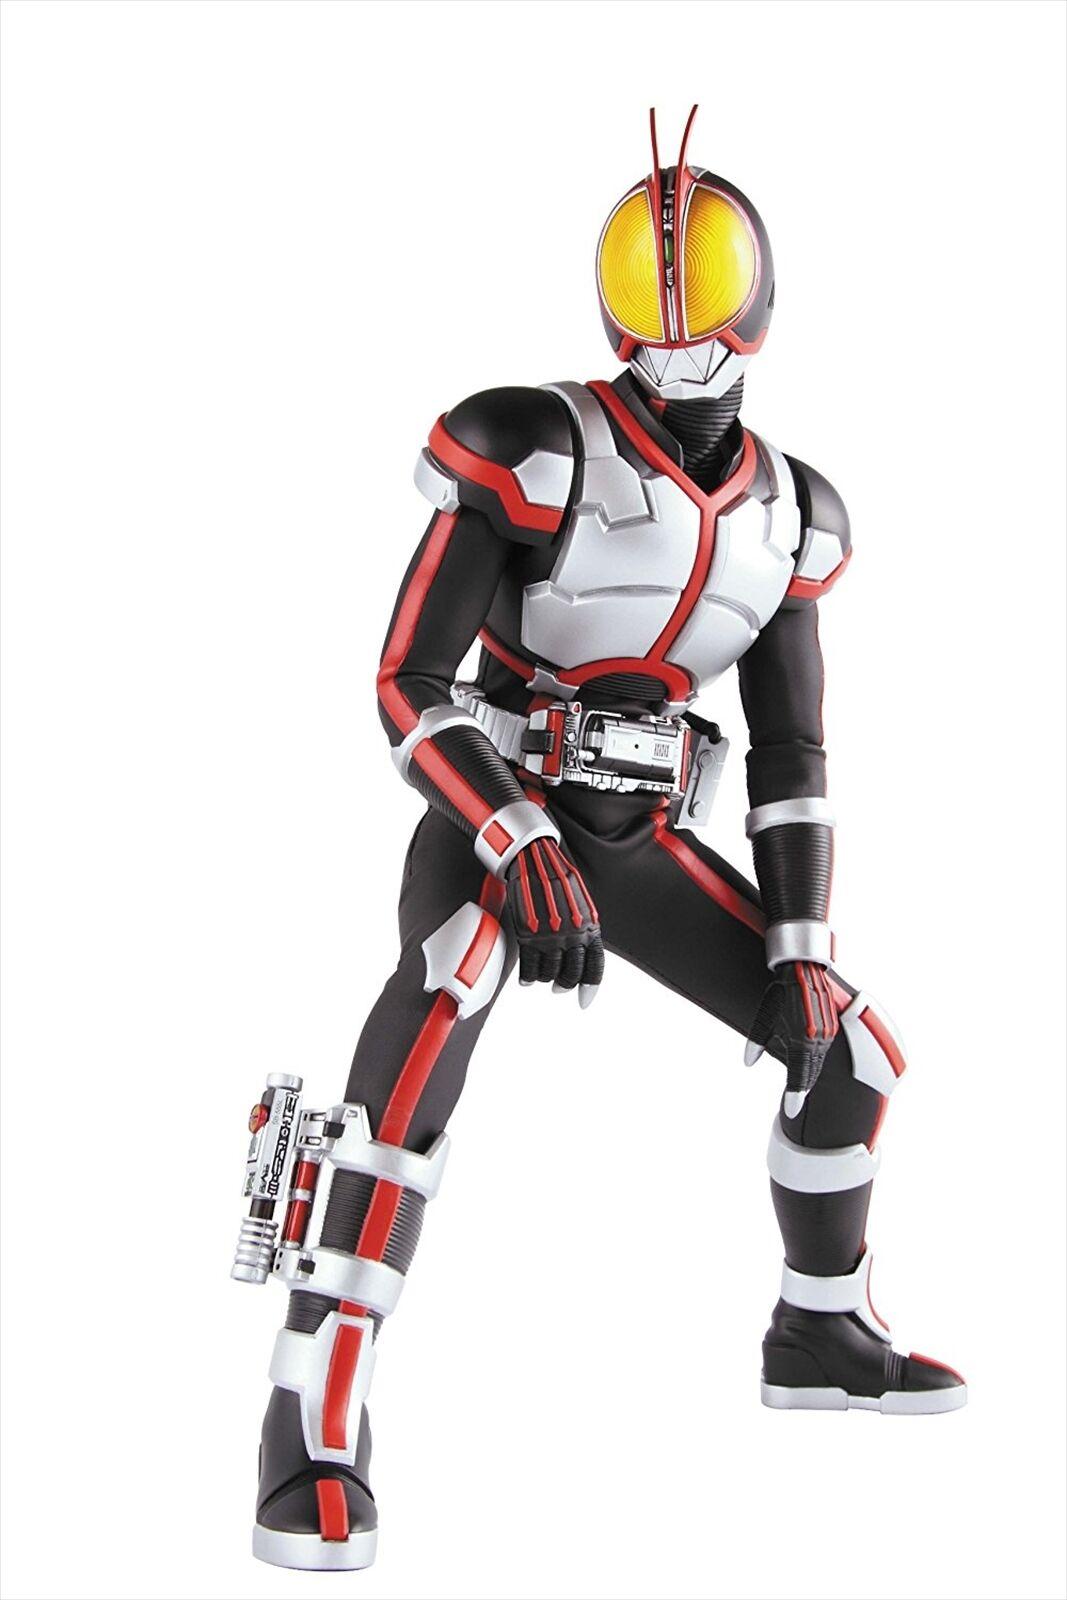 Medicom RAH Masked Kamen Rider Faiz 1/6 Real Action Hero Figure